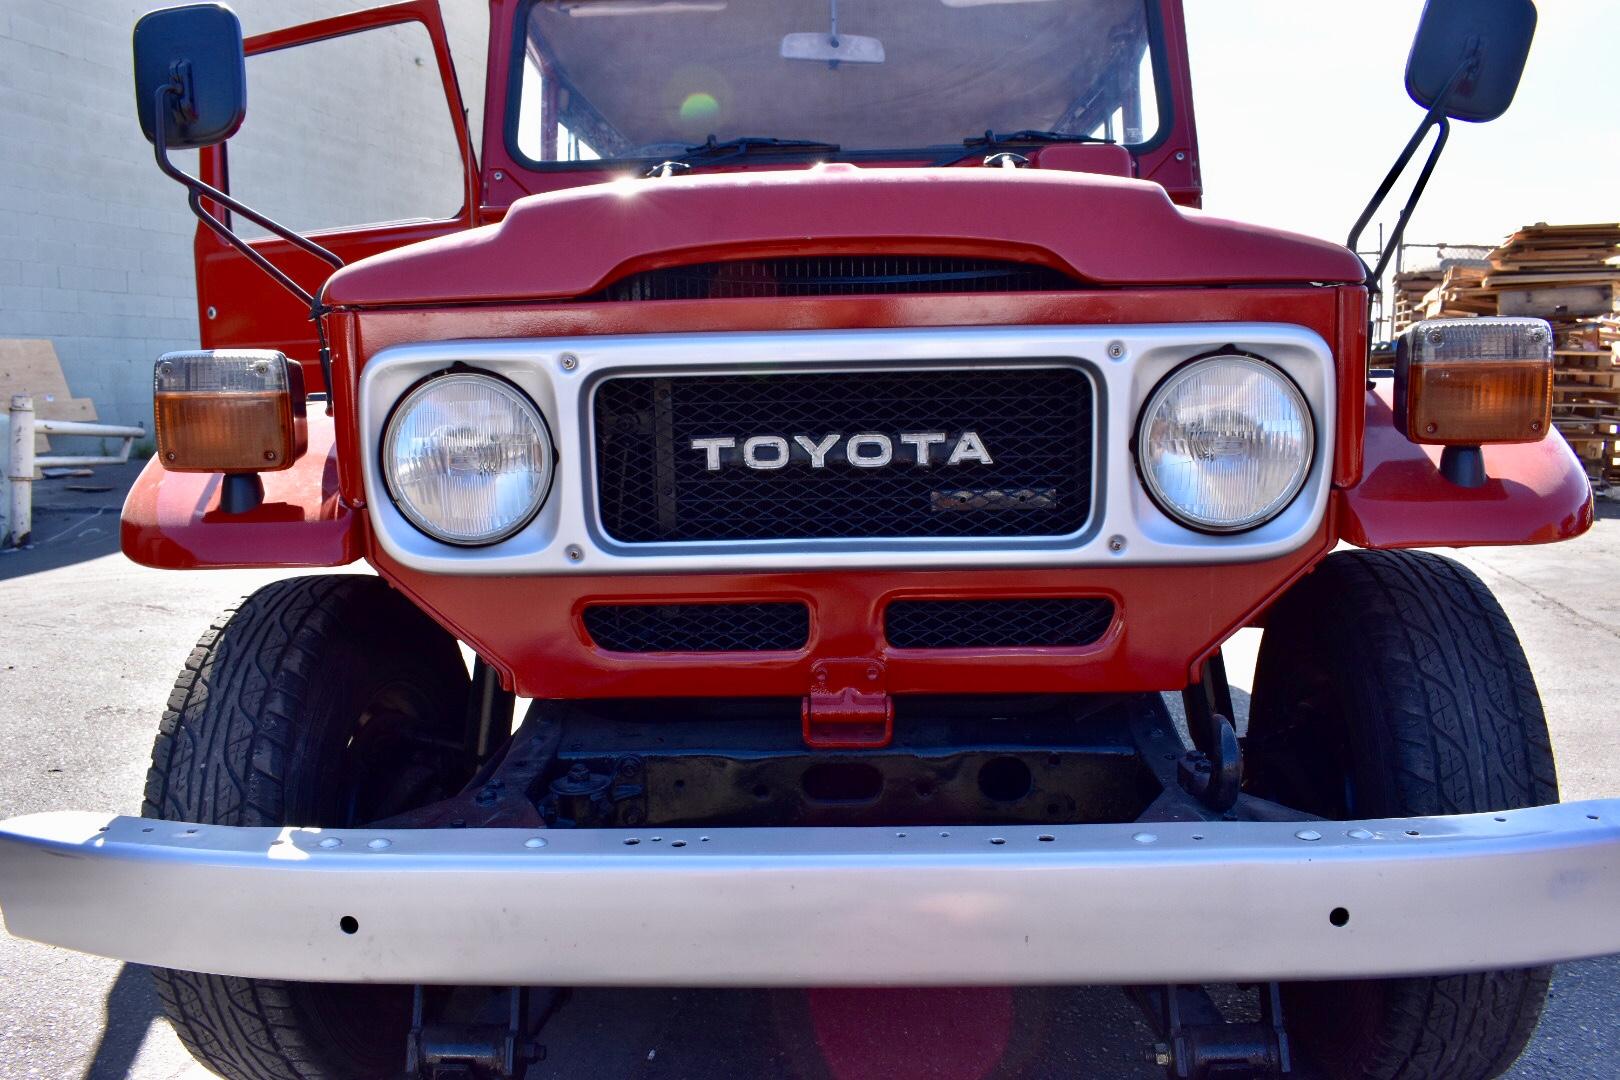 1983 Toyota Land Cruiser Bj46 Yota Imports Full